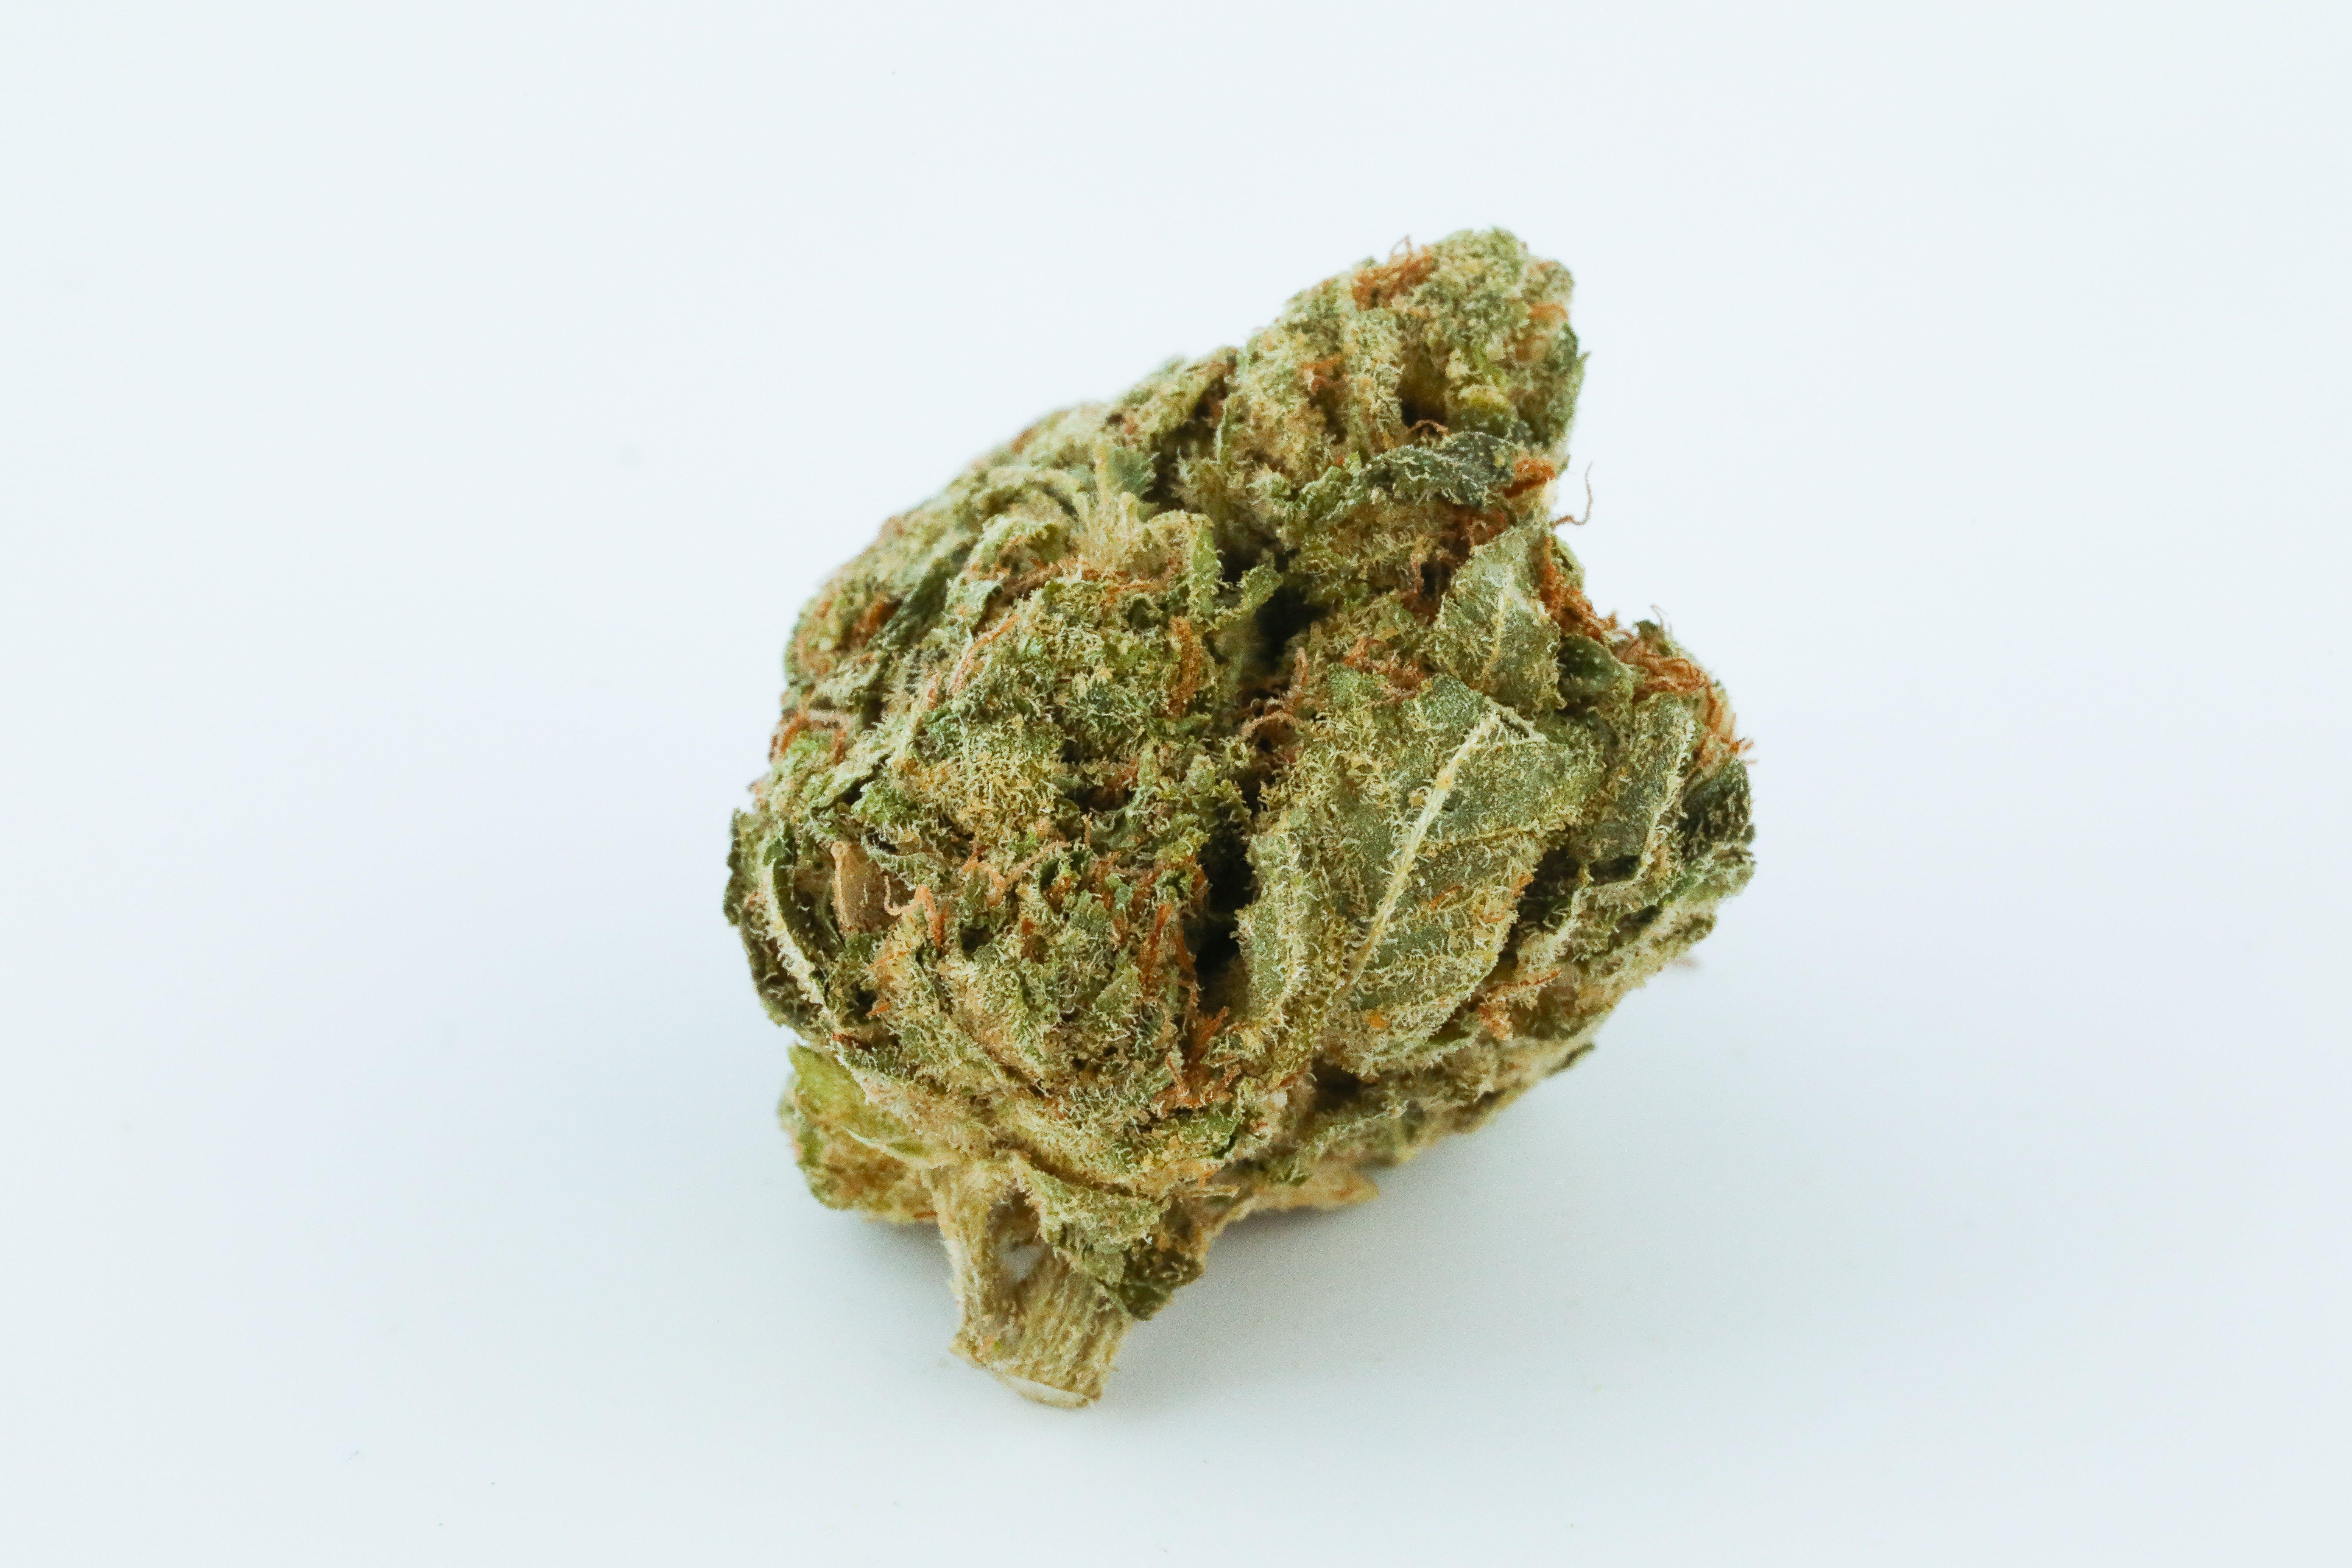 AK-47 Weed; AK-47 Cannabis Strain; AK-47 Hybrid Marijuana Strain